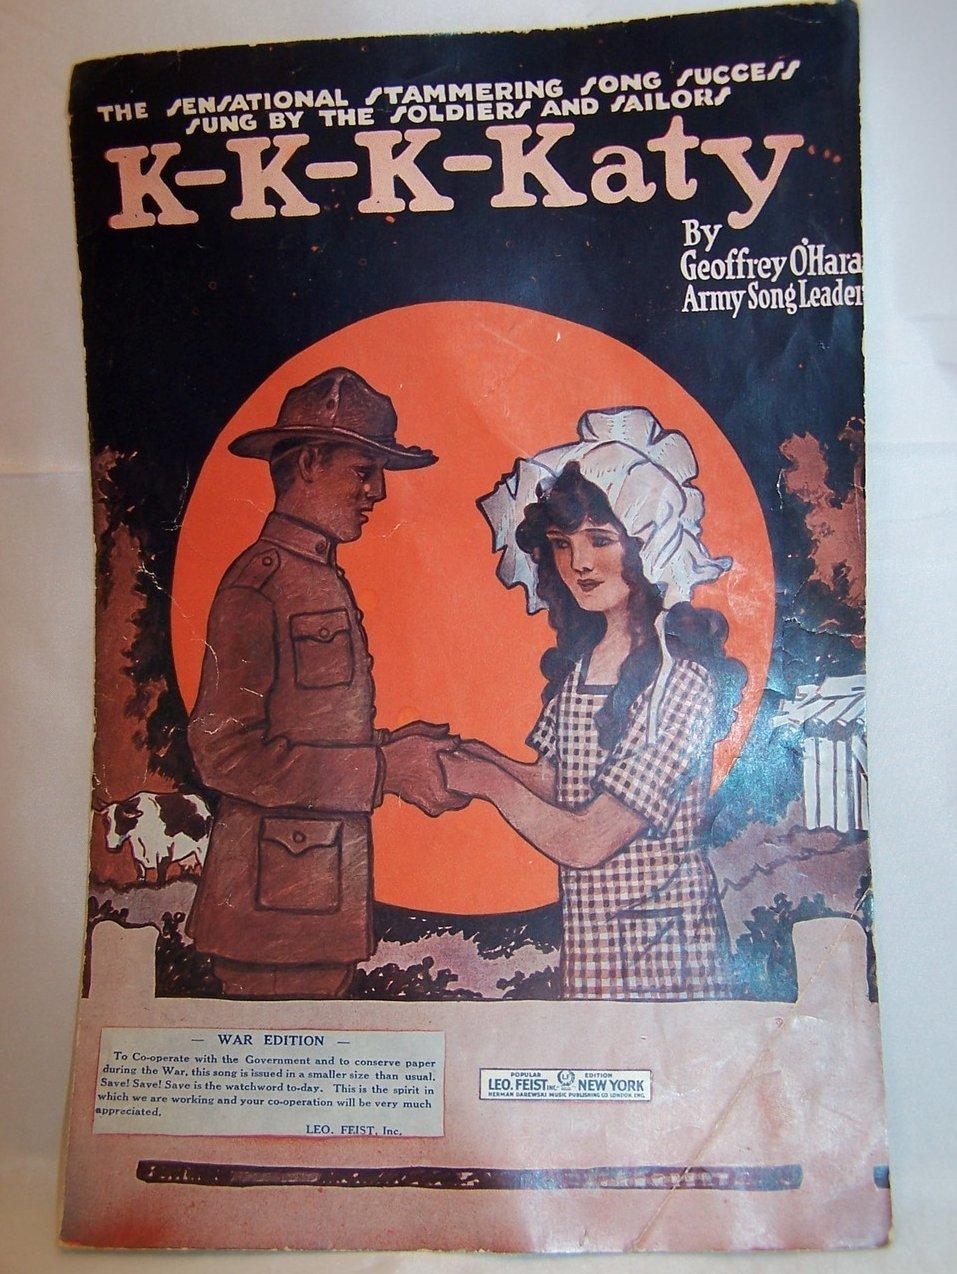 Katy Sheet Music by Army Song Leader Geoffrey O'Hara, 1918